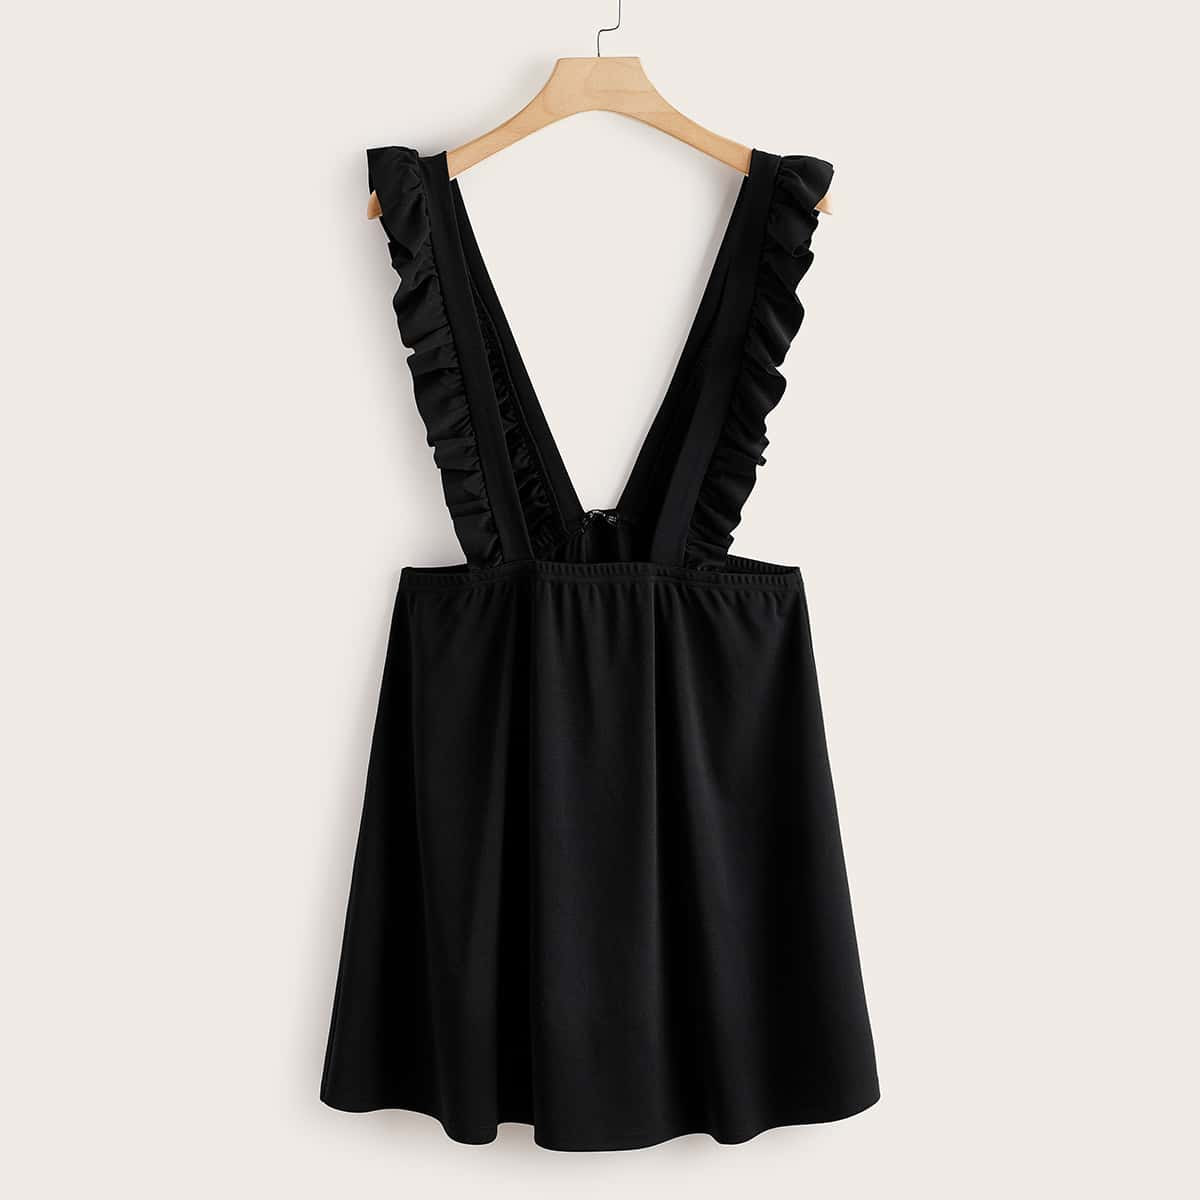 shein Zwart Preppy Vlak Grote maat jurk Rimpeling